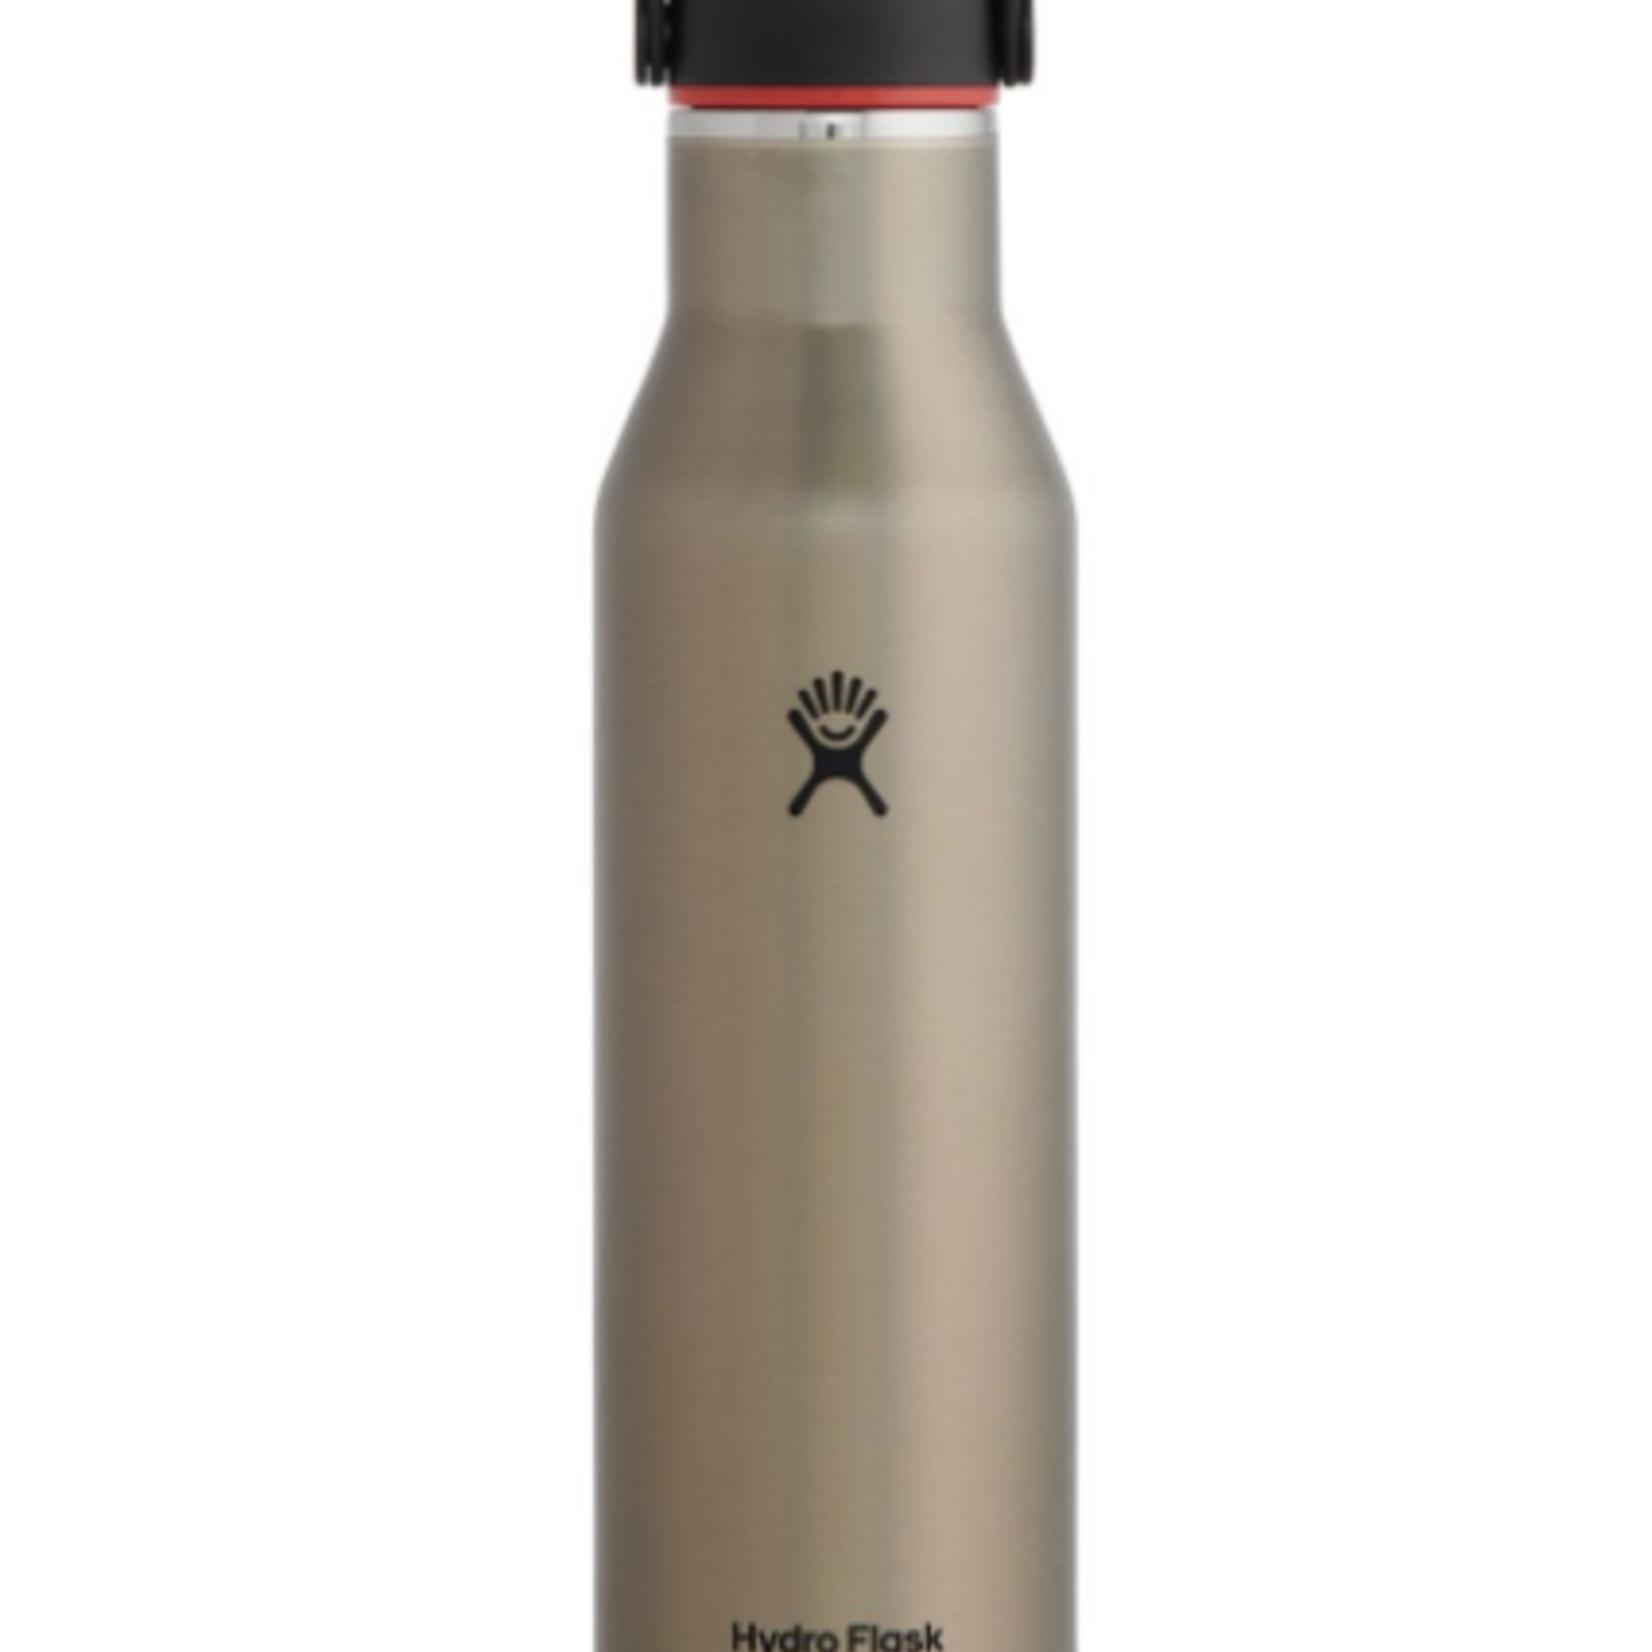 Hydro Flask Hydro Flask 21 Oz Lightweight Standard Mouth Trail Series